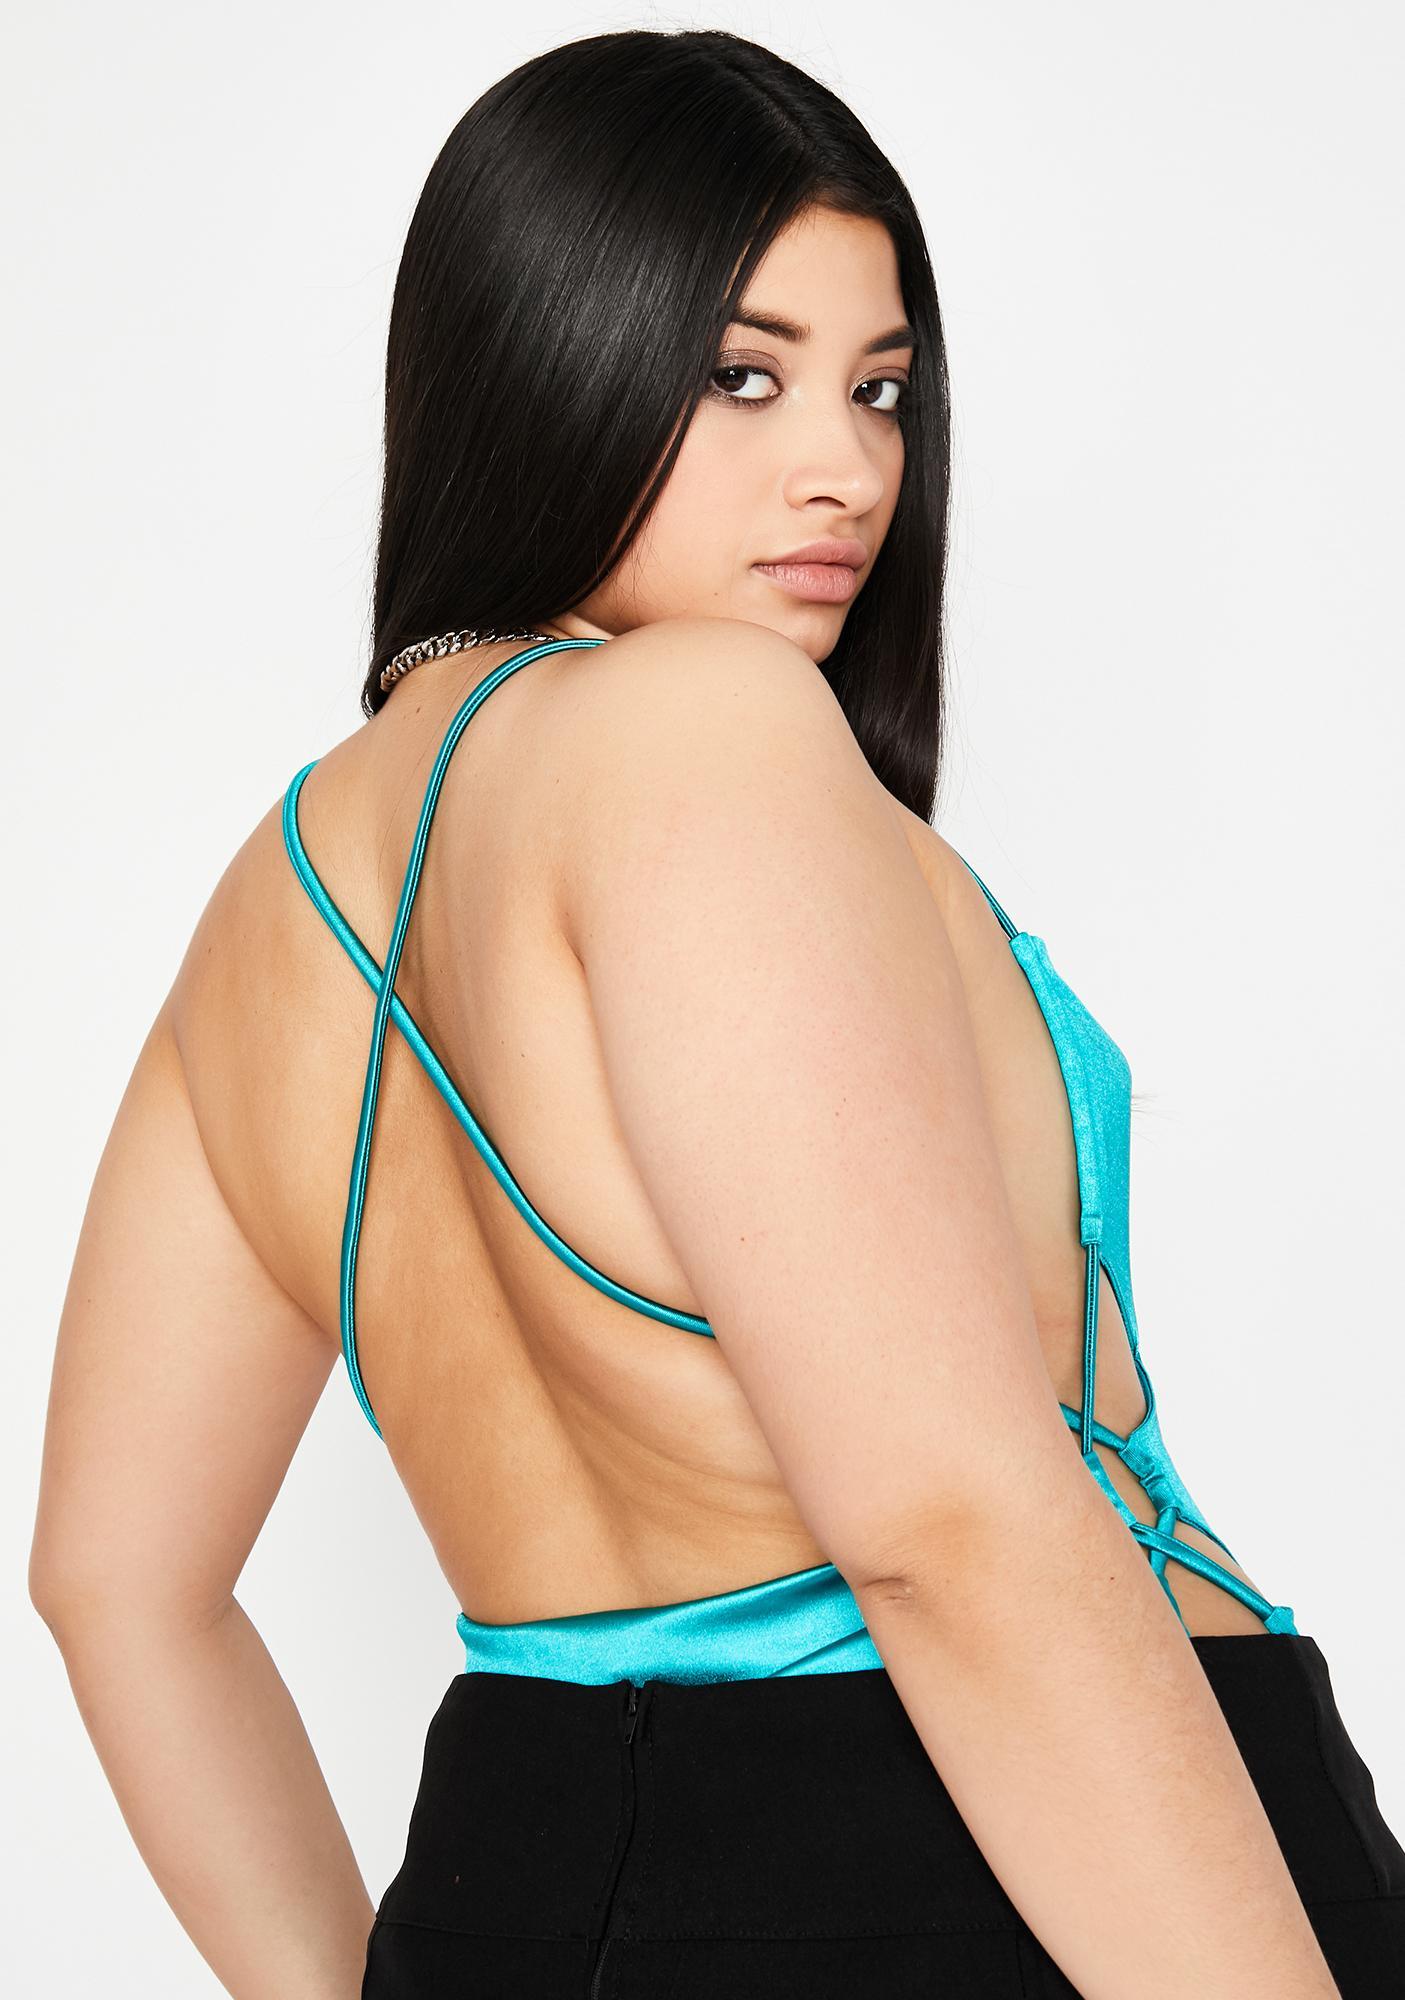 Berry Totally Tangled Desires Bodysuit